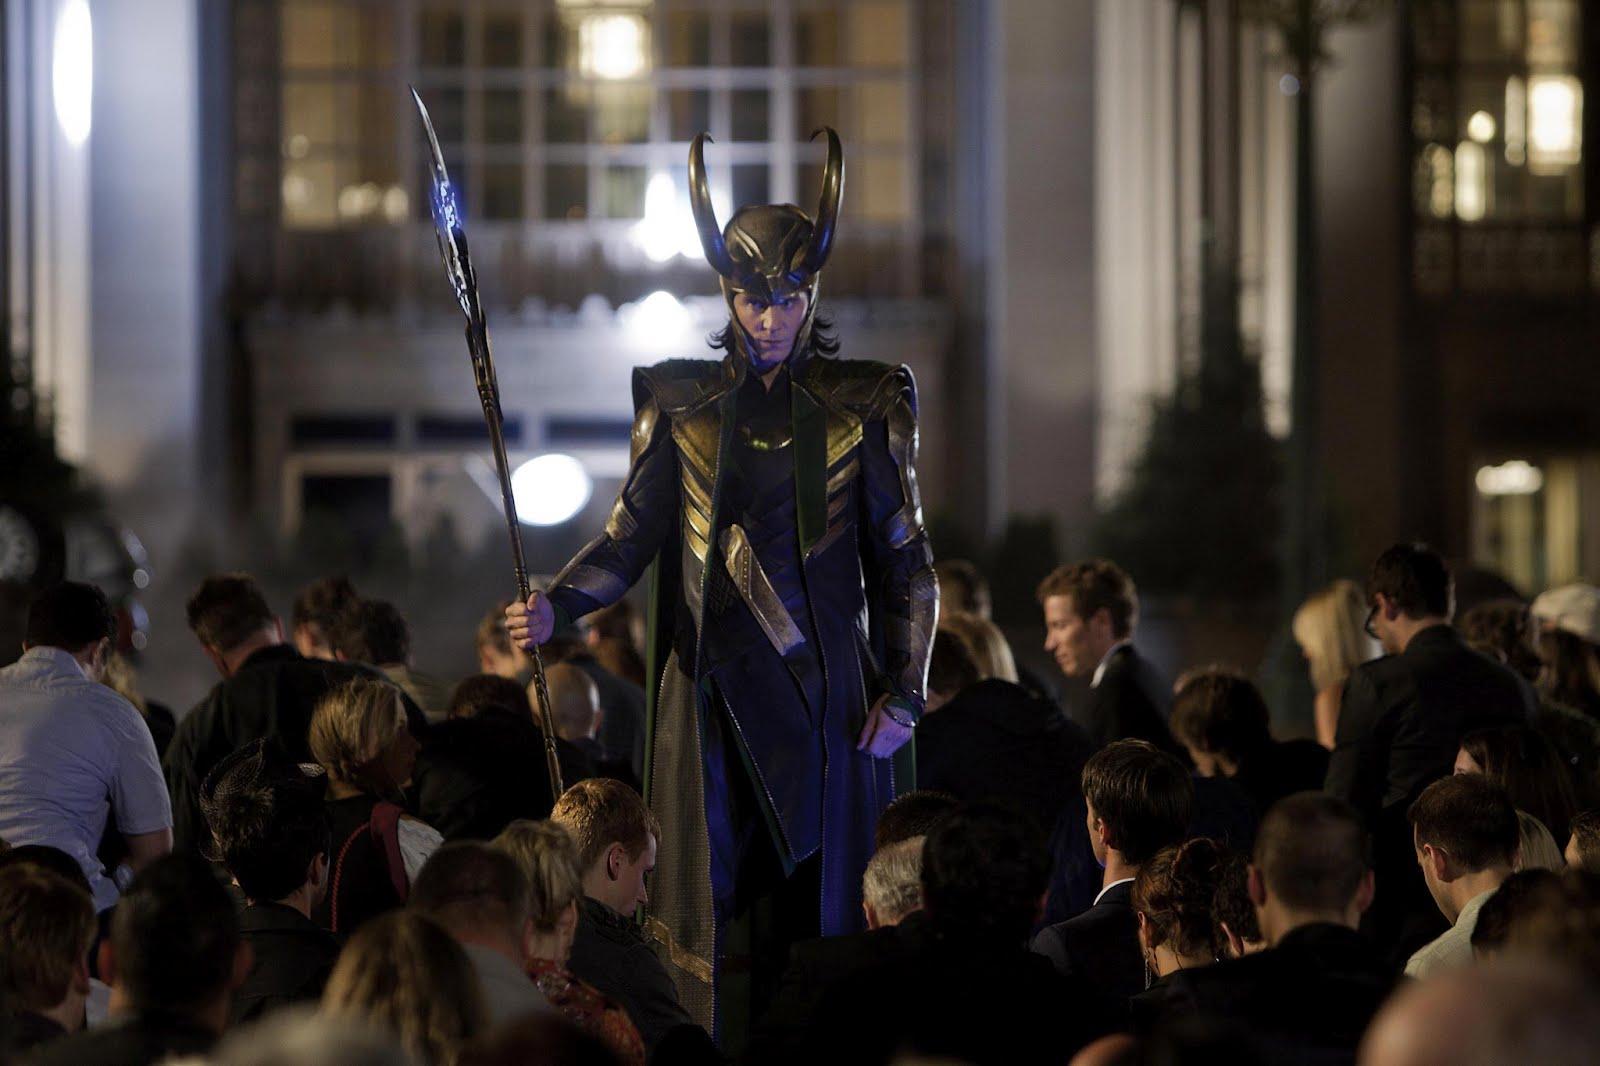 http://3.bp.blogspot.com/-tSFjhZ2hmFY/T4gsiPIk-sI/AAAAAAAAAMo/JKDpZAWCqjM/s1600/Marvels-The_Avengers%2B%25288%2529.jpg